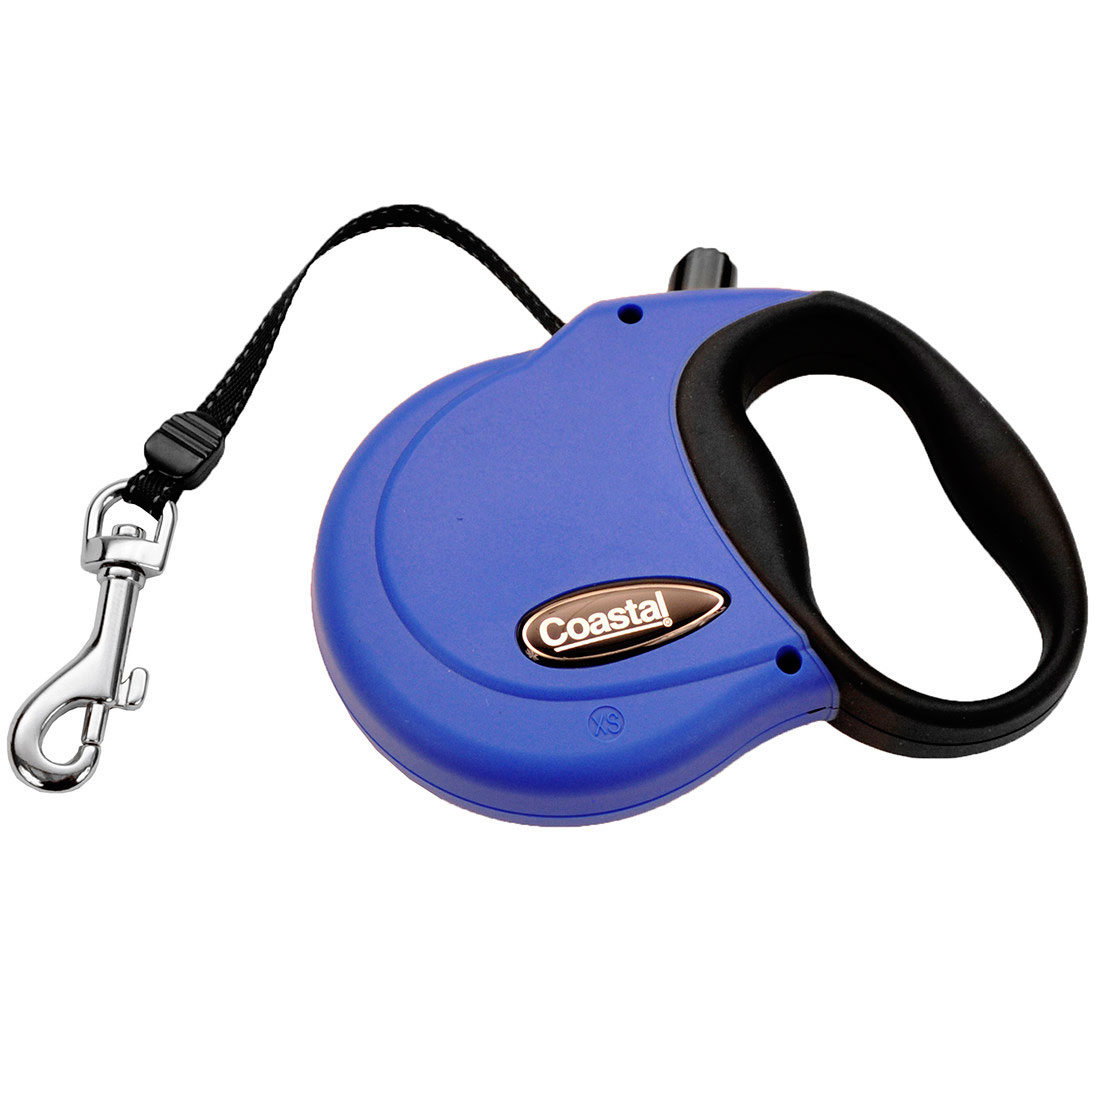 Coastal Power Walker Retractable Dog Leash, Blue, Large, 16-in